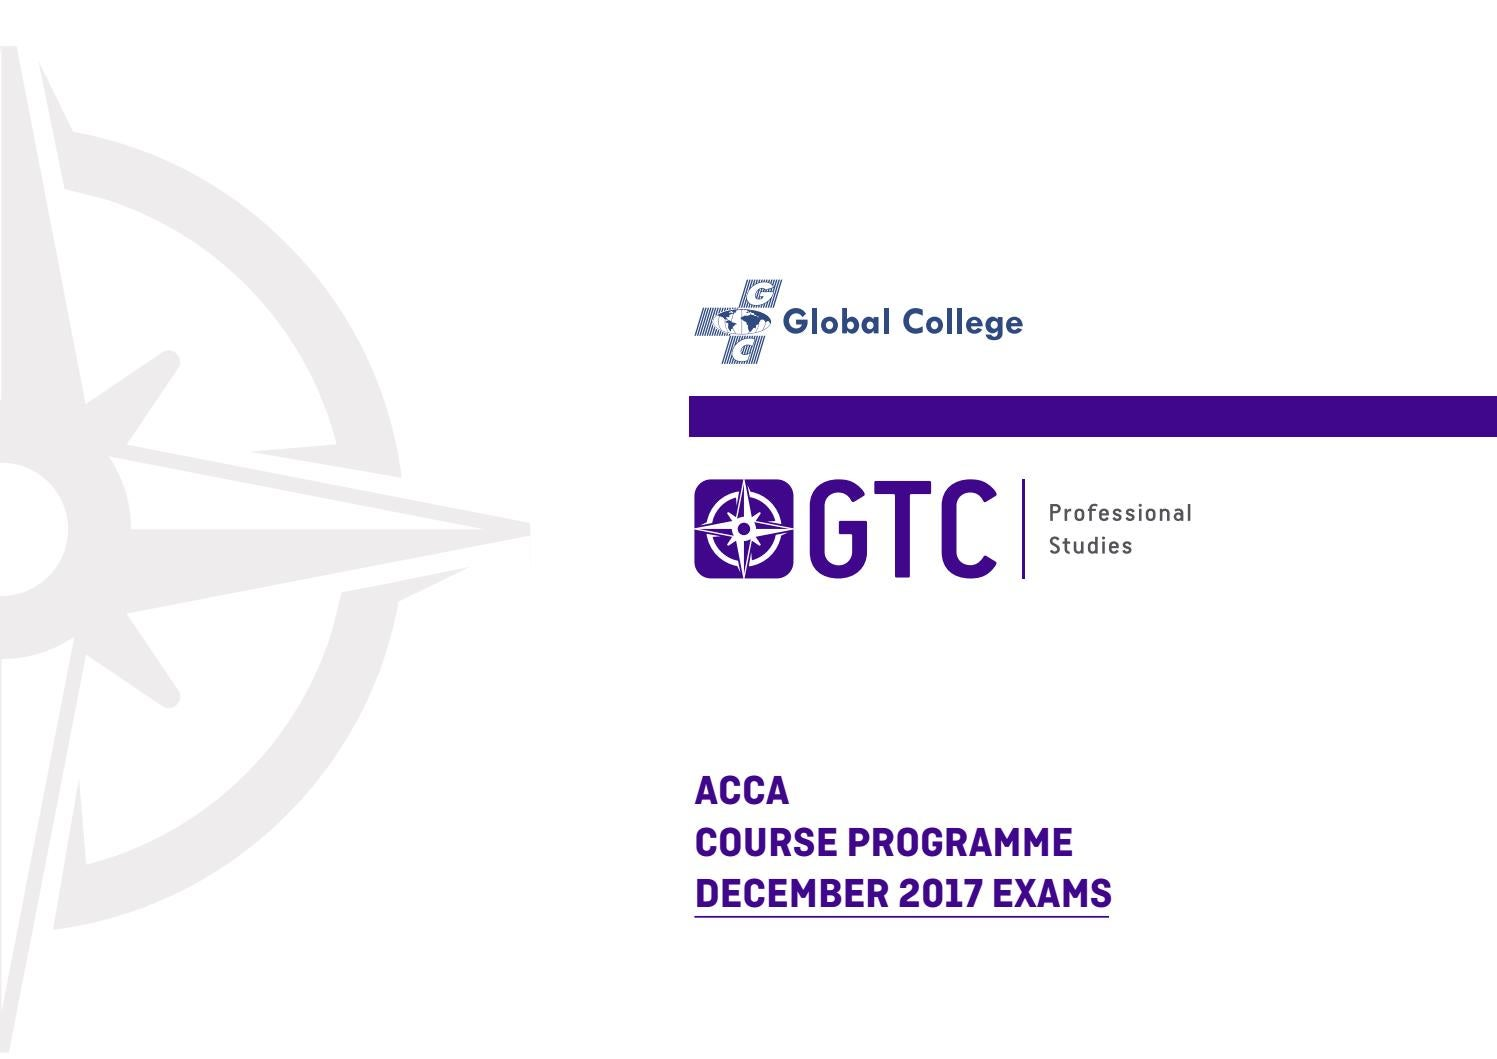 Gtc course programme december 2017 exams by gtc professional gtc course programme december 2017 exams by gtc professional studies issuu xflitez Images